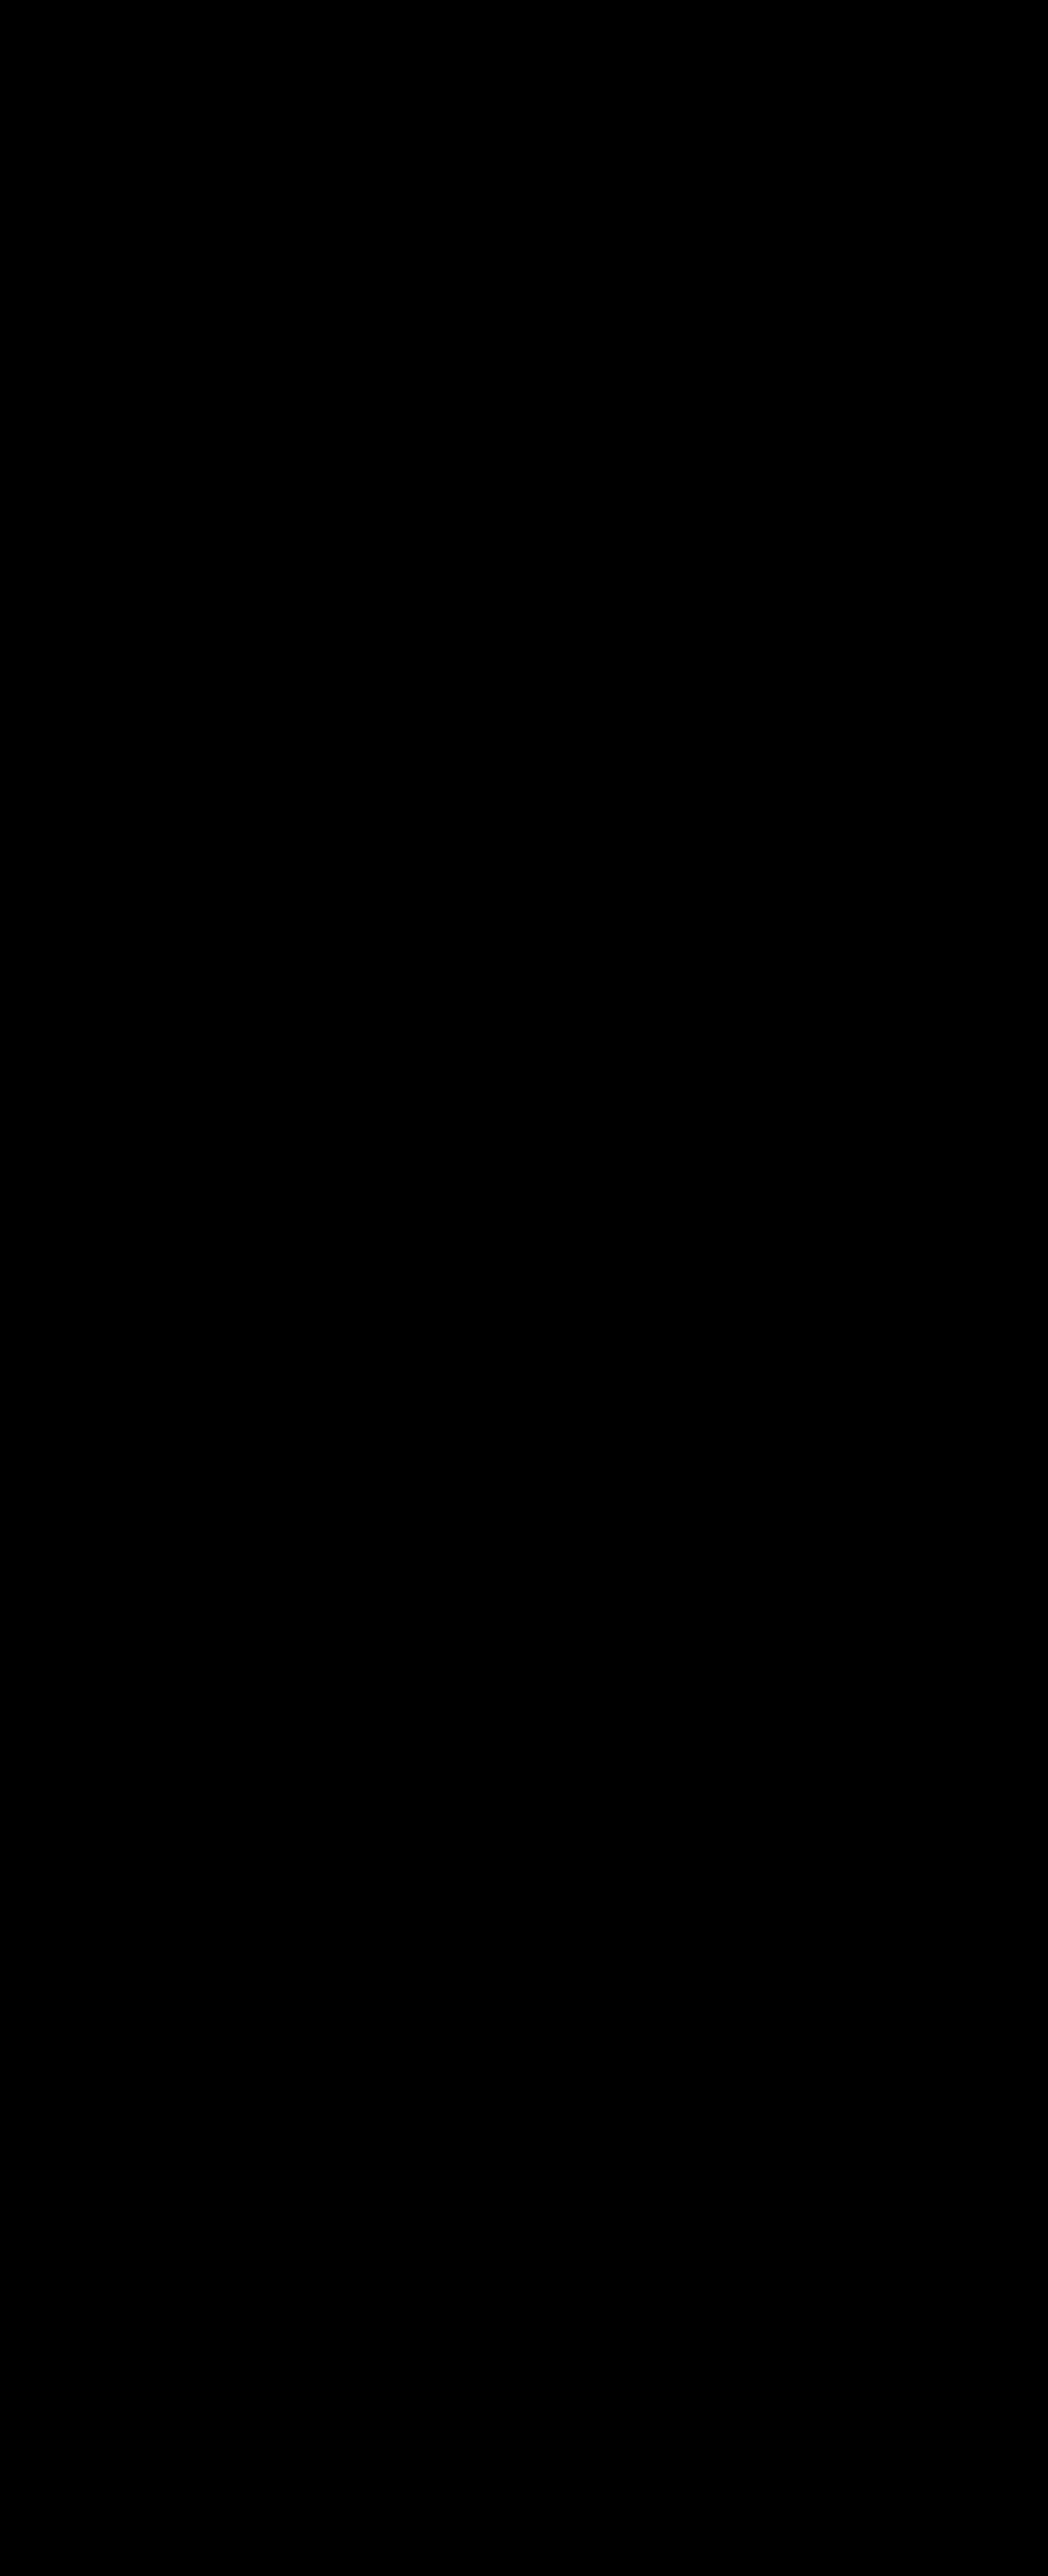 4-Methyl-2-oxo-2H-1-benzopyran-7-yl--D-glucopyranosiduronic Acid Methyl Ester 2,3,4-Triacetate